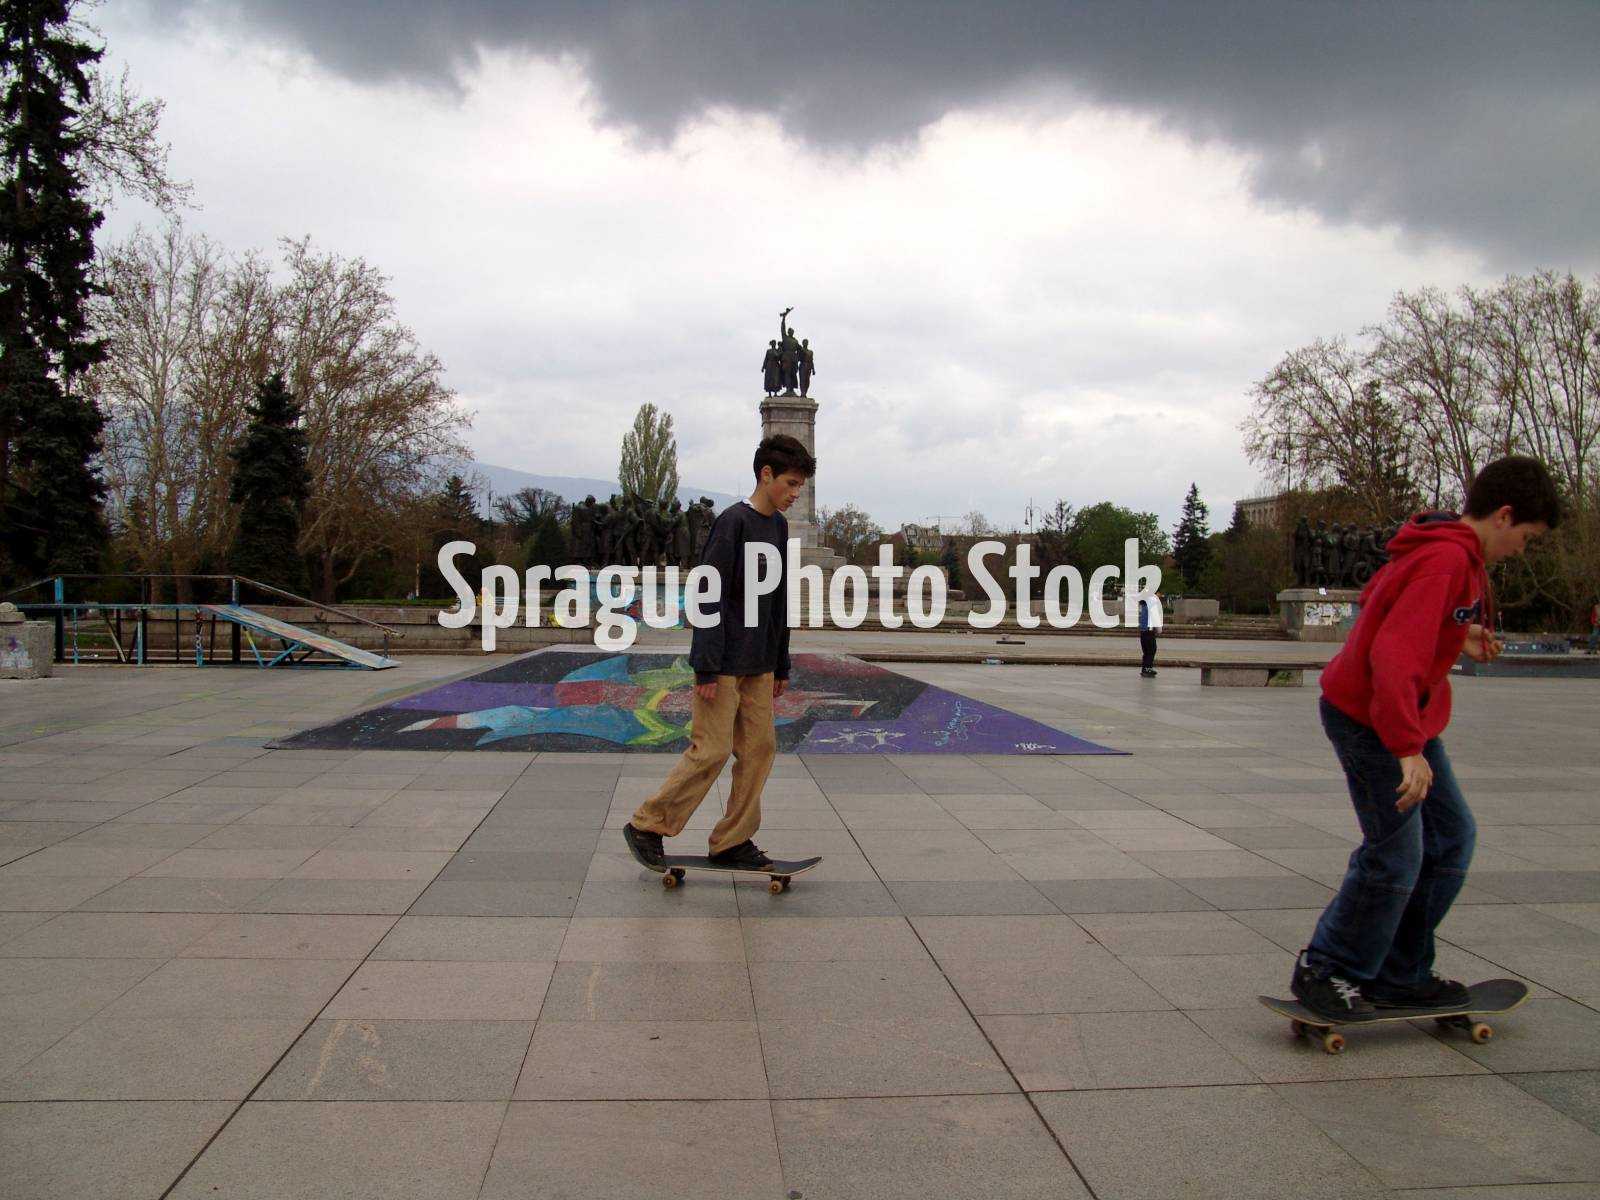 Skateboarders, Sofia, Bulgaria.